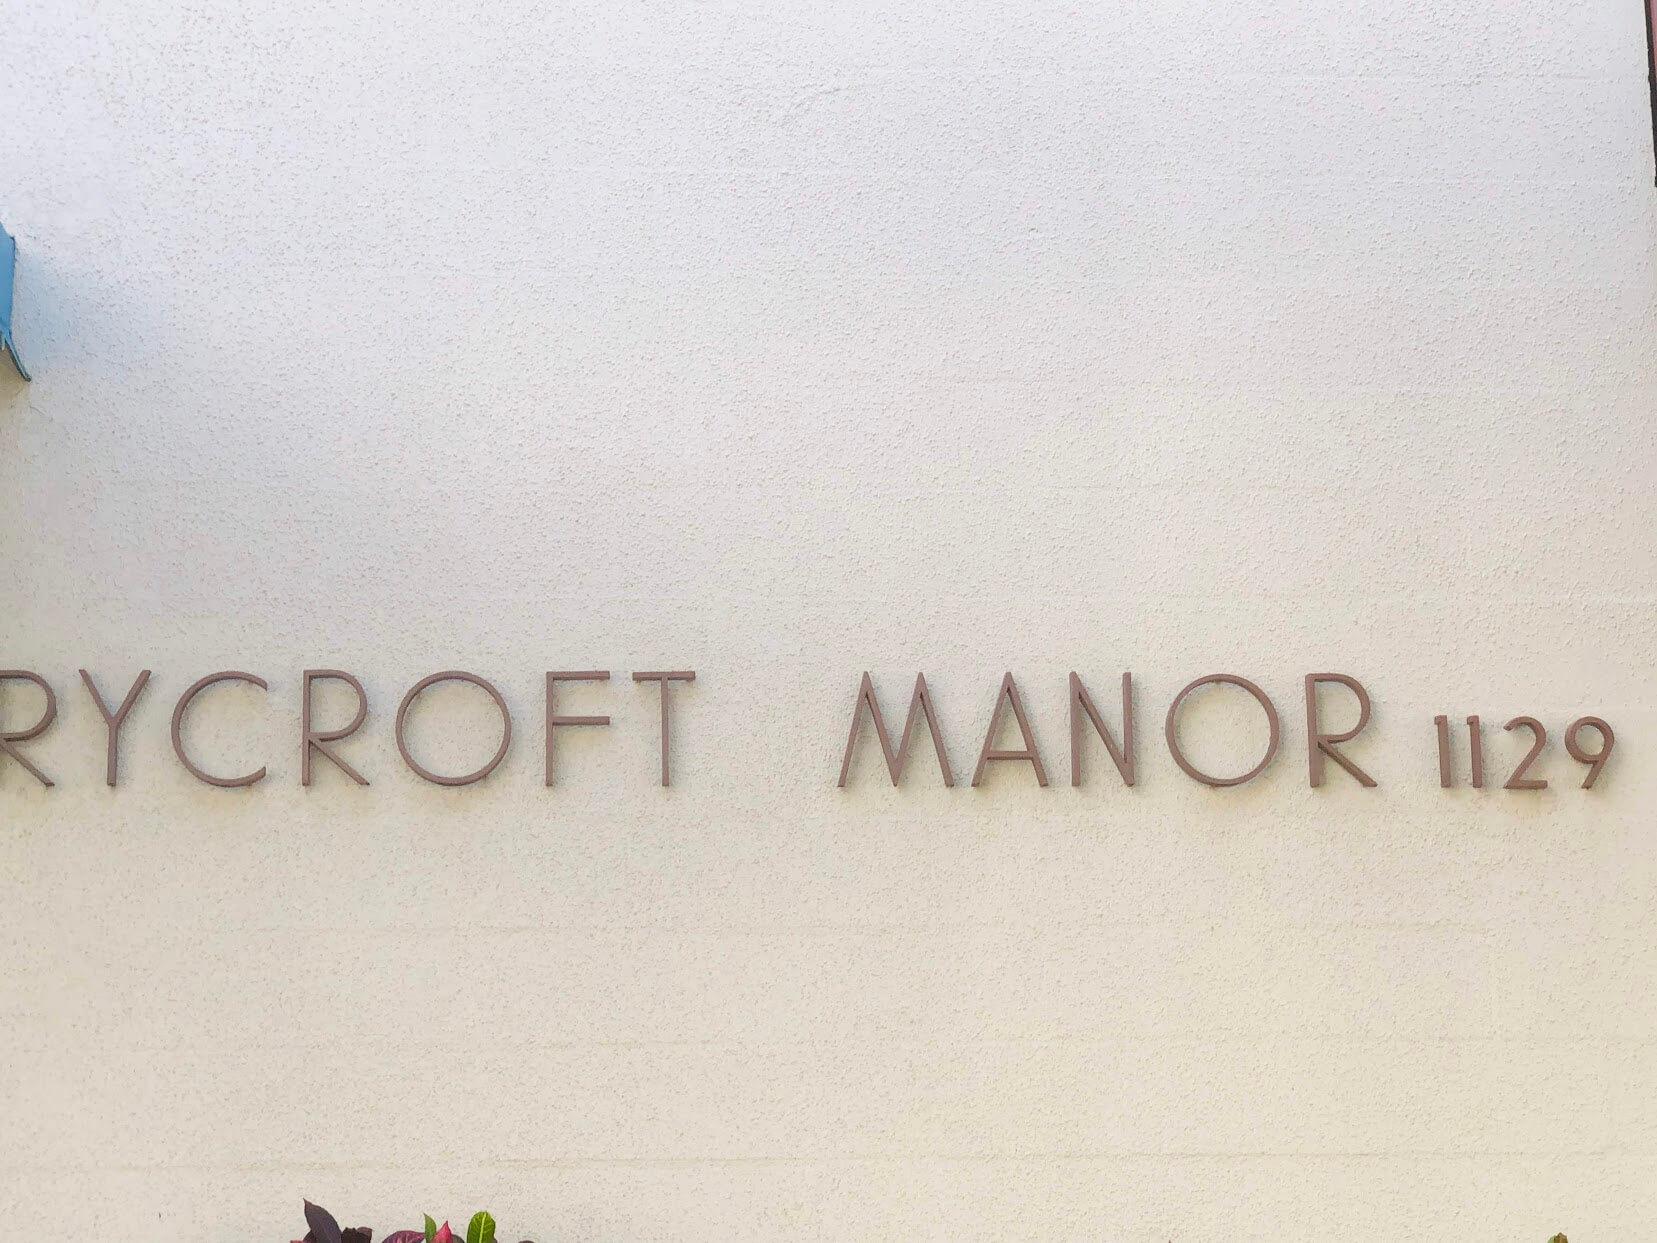 Rycroft Manorの看板